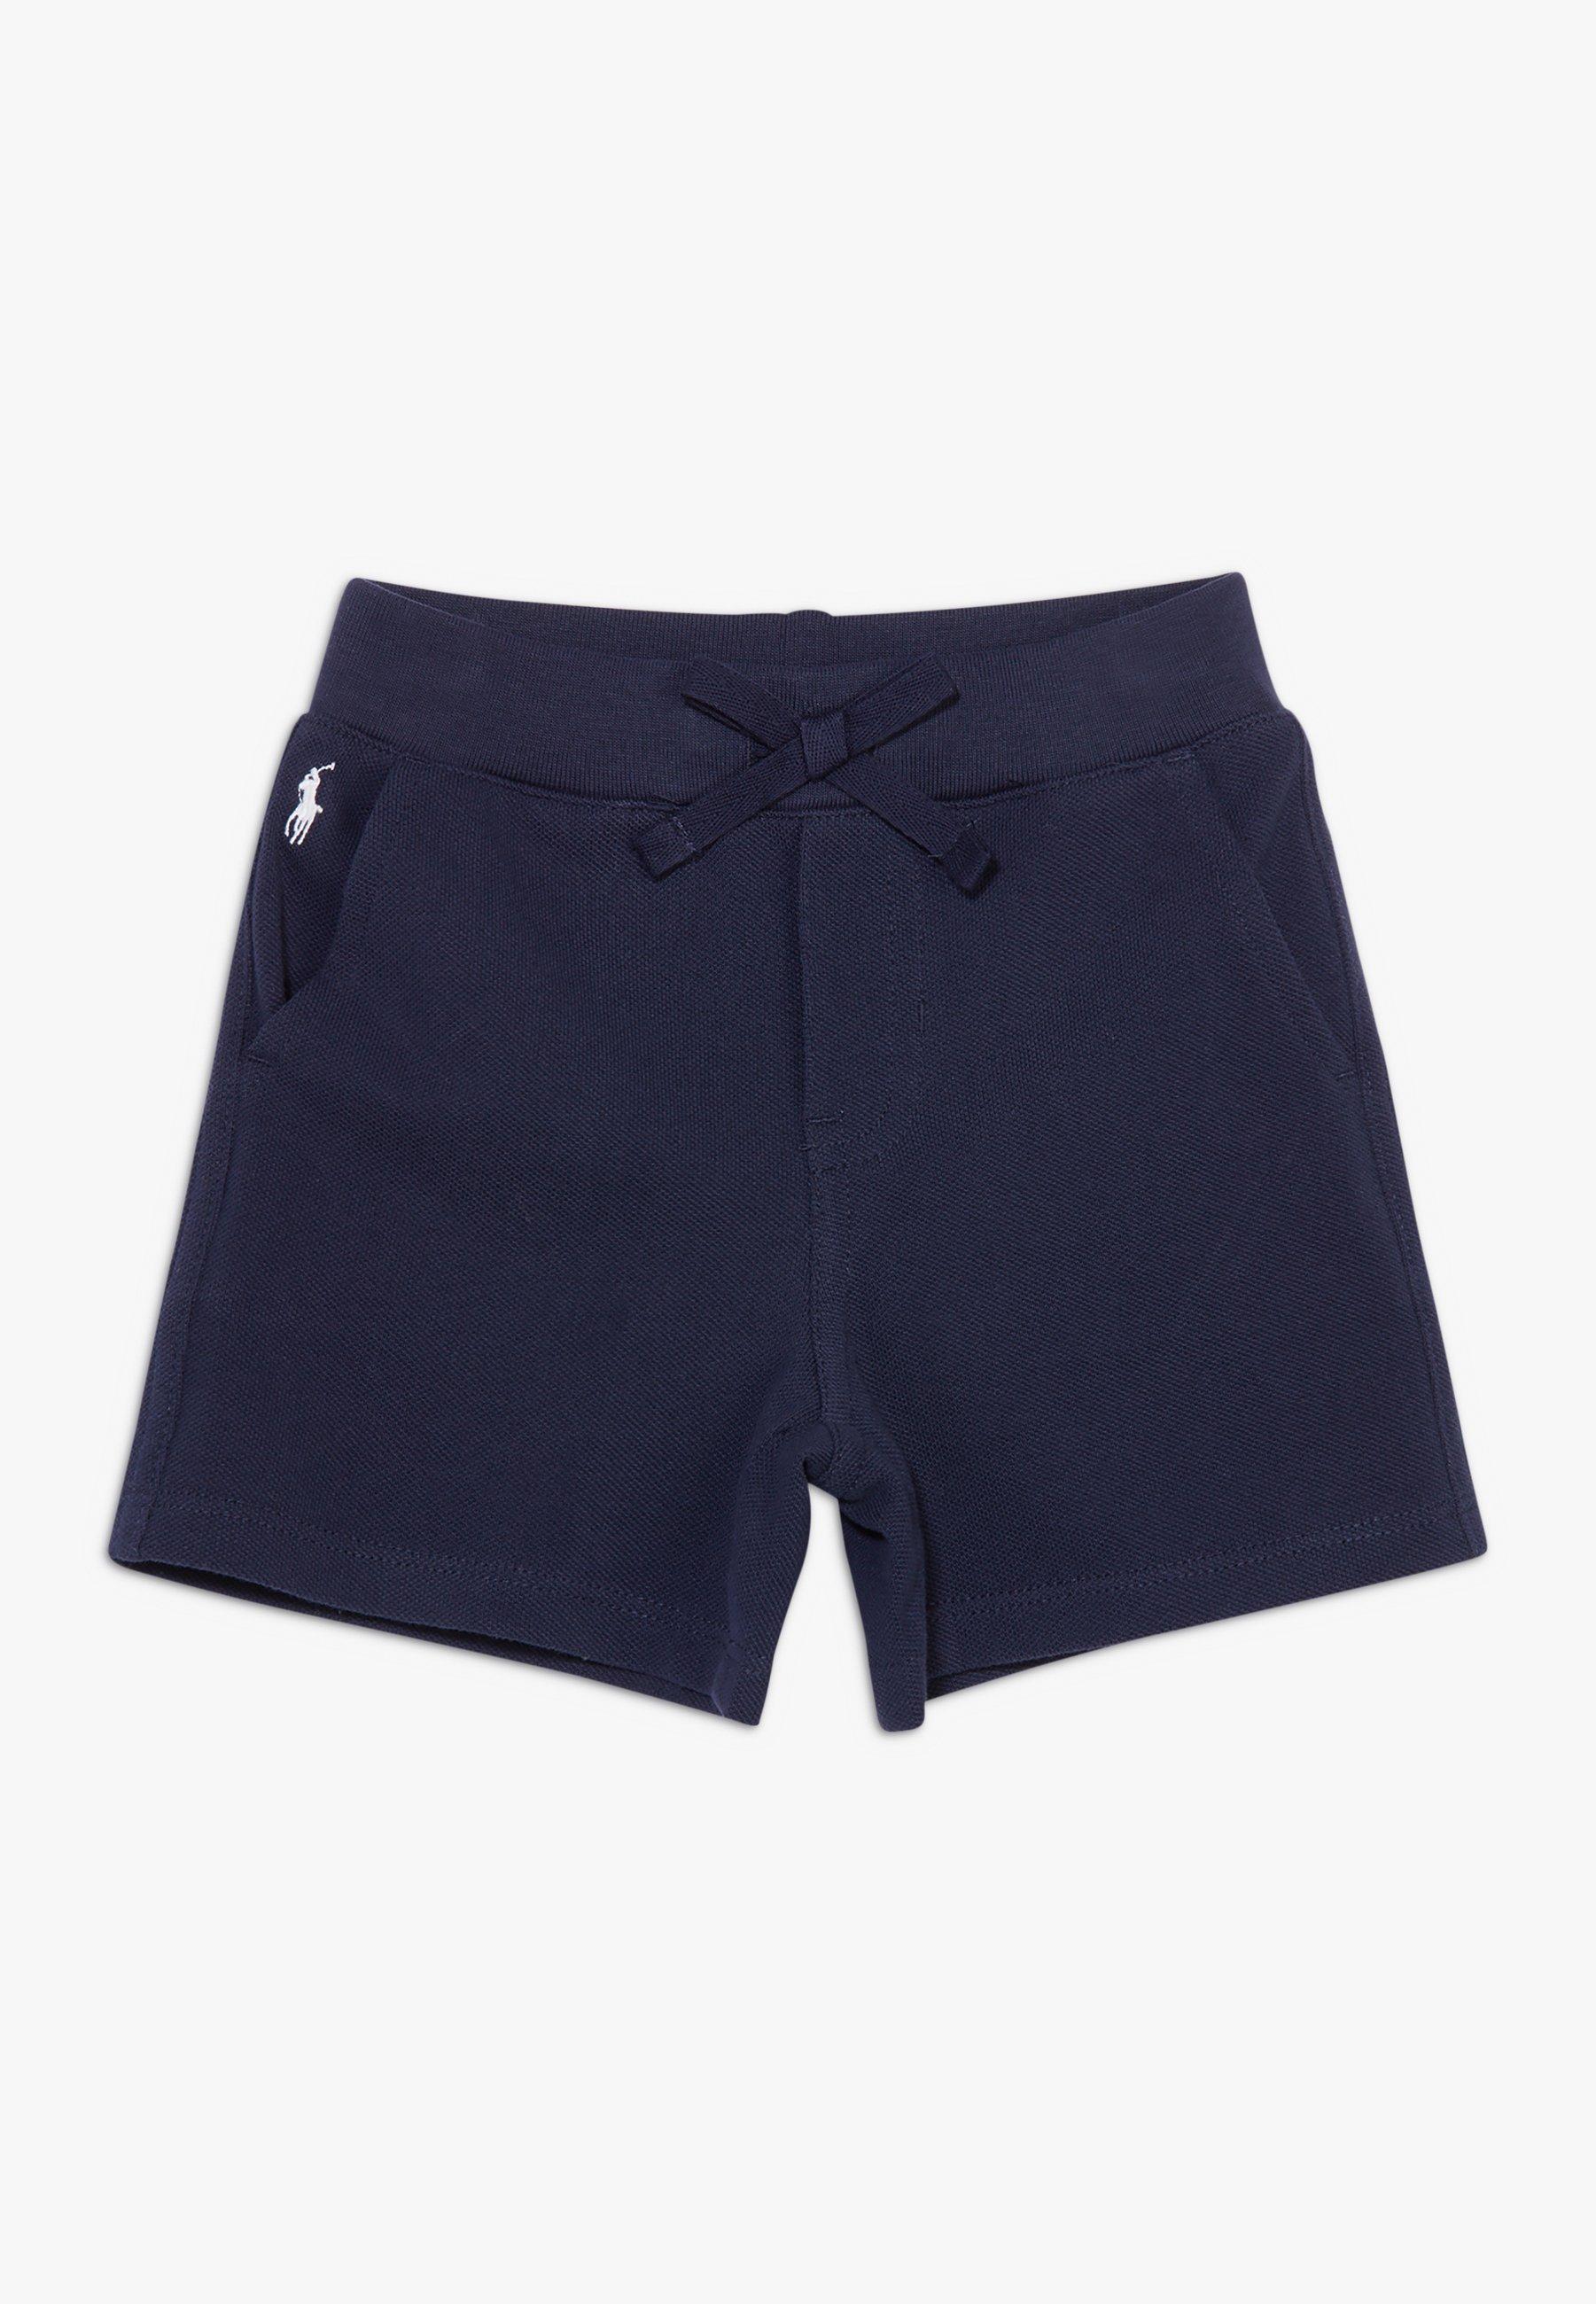 Kids BOTTOMS - Shorts